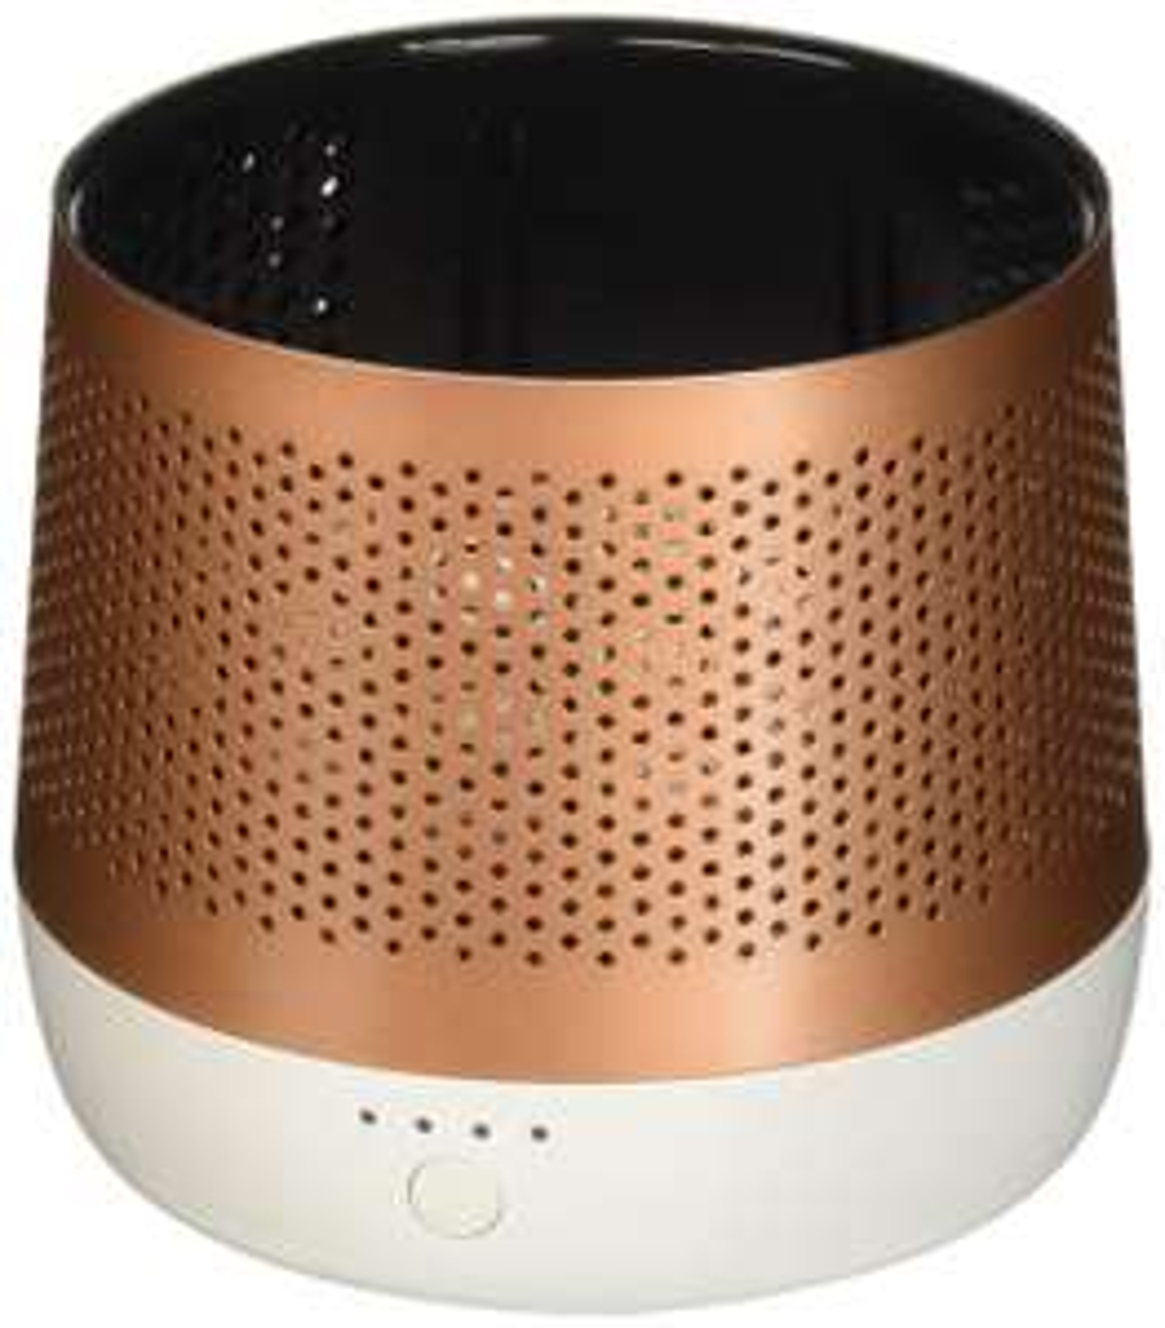 Batterie Ninety7 LOFT pour Google Home